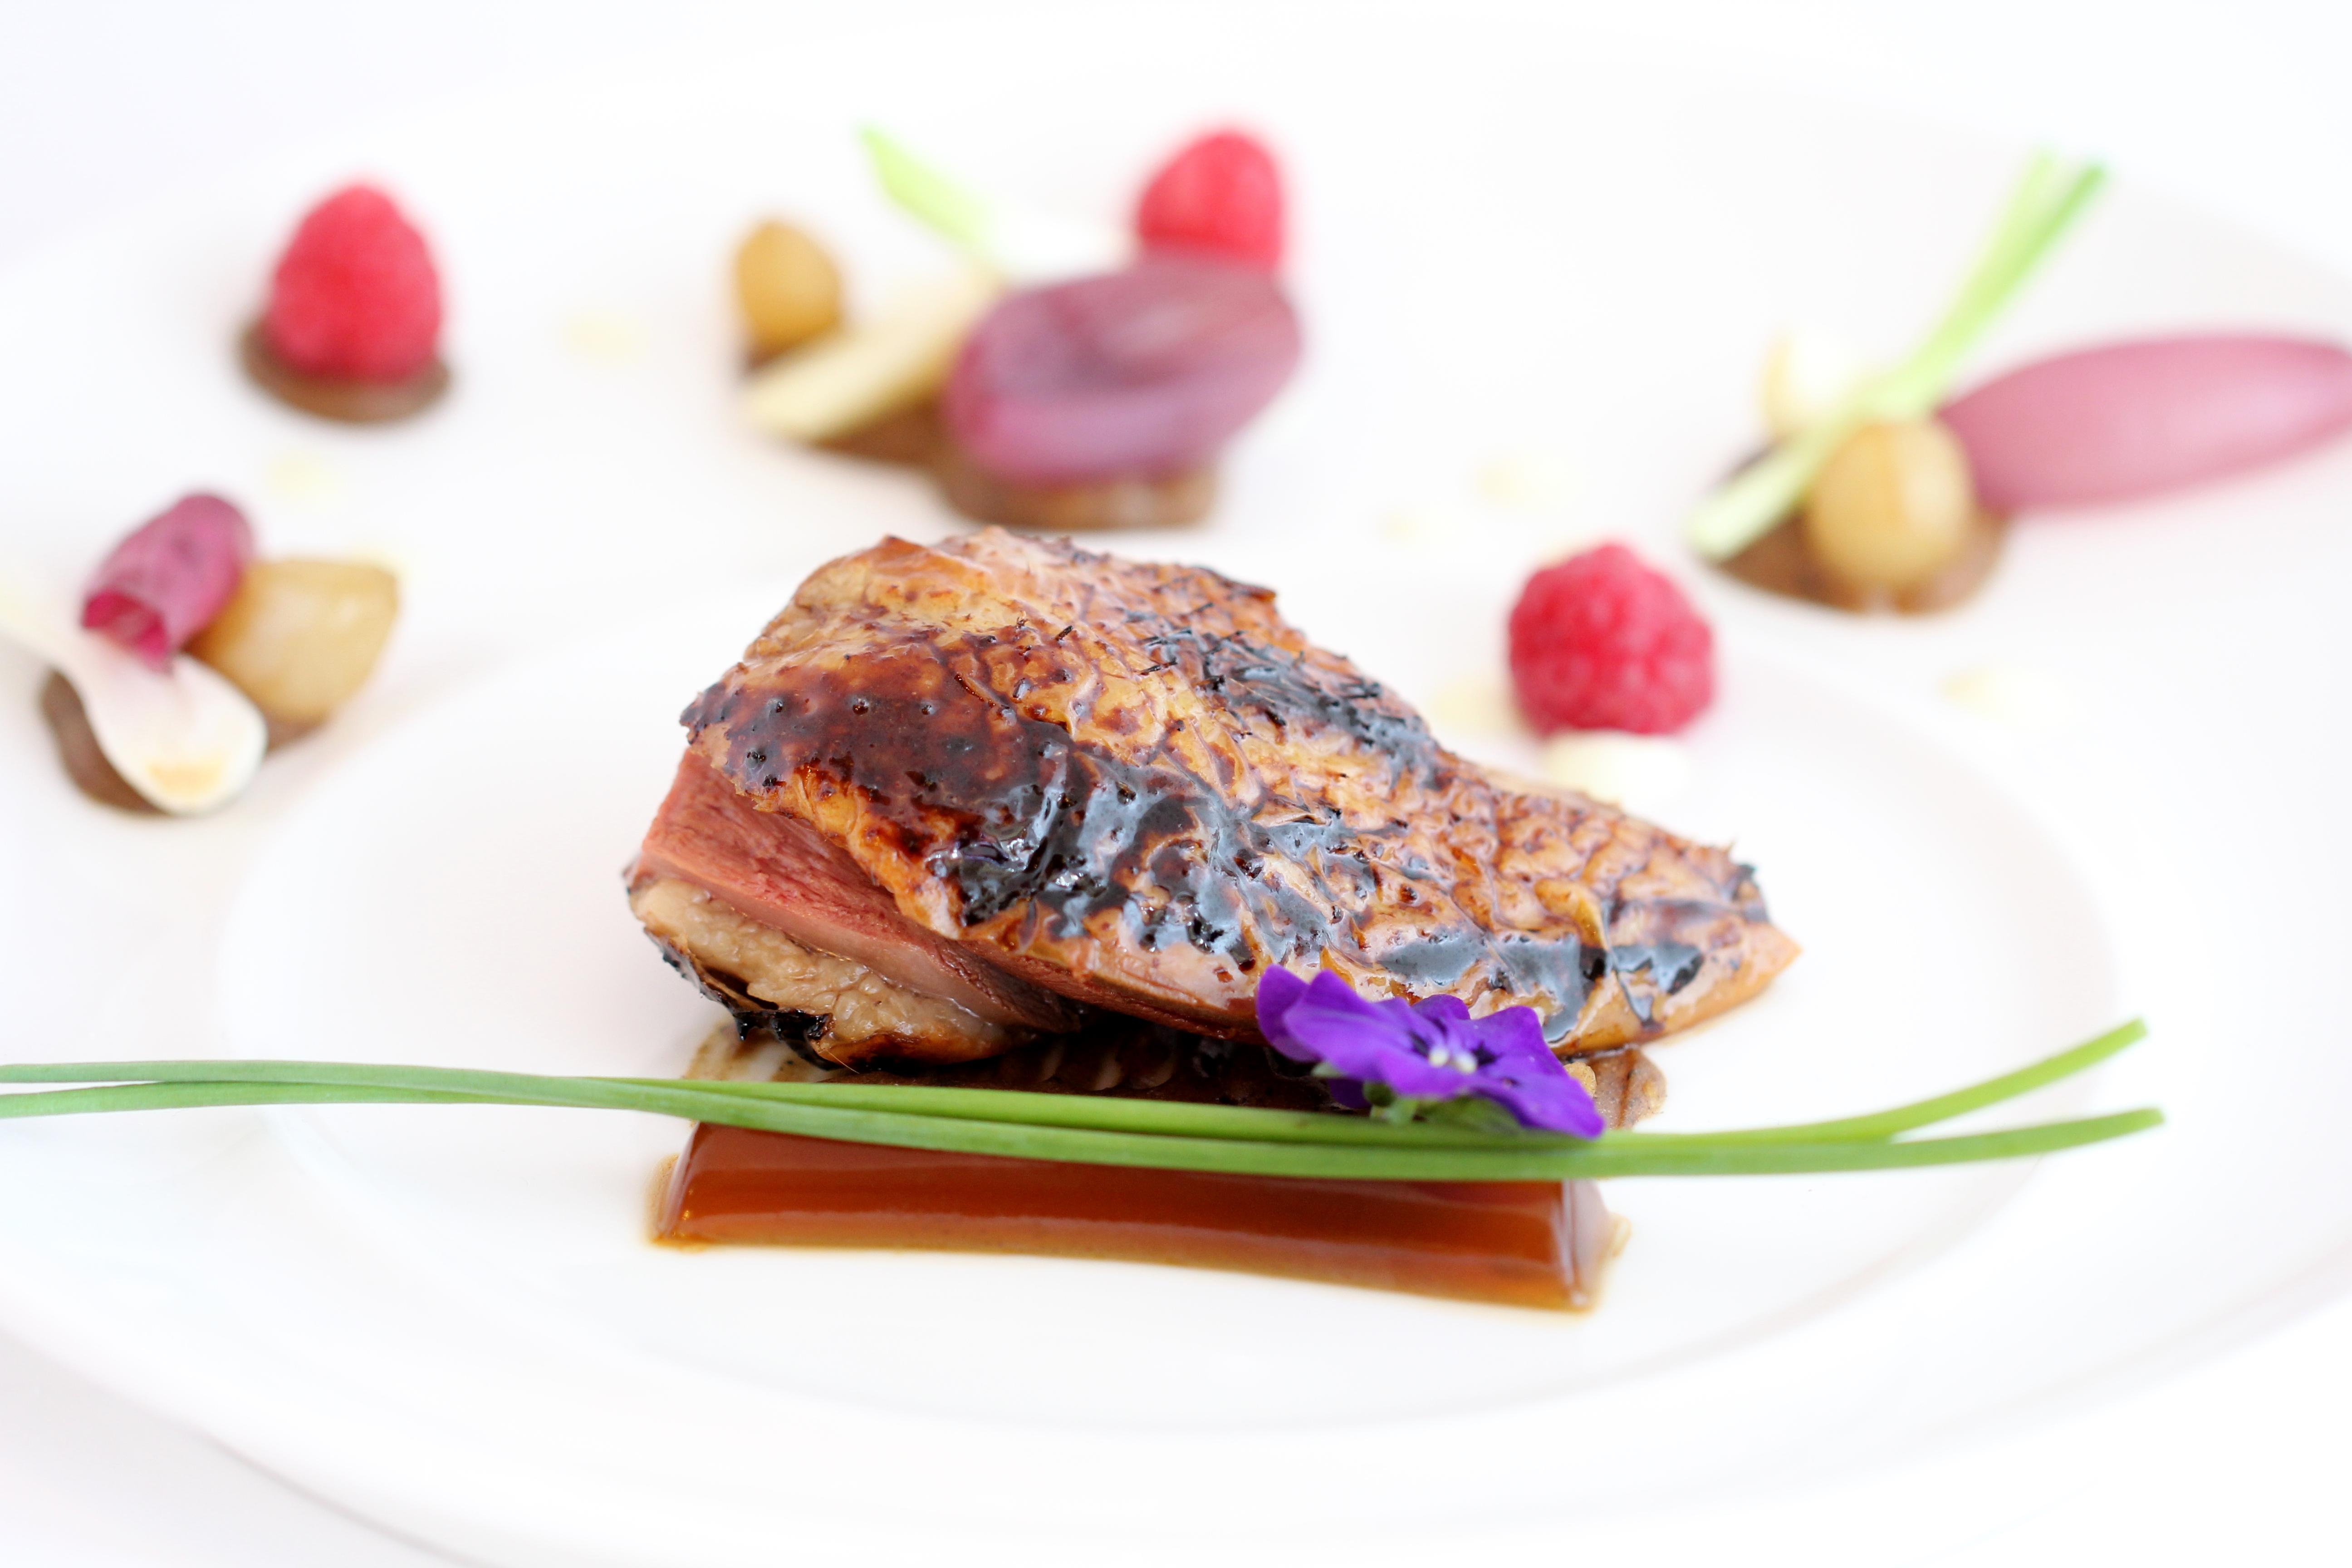 Bellevue Rheinhotel_Boppard_Gourmetrestaurant_Effilé Taube